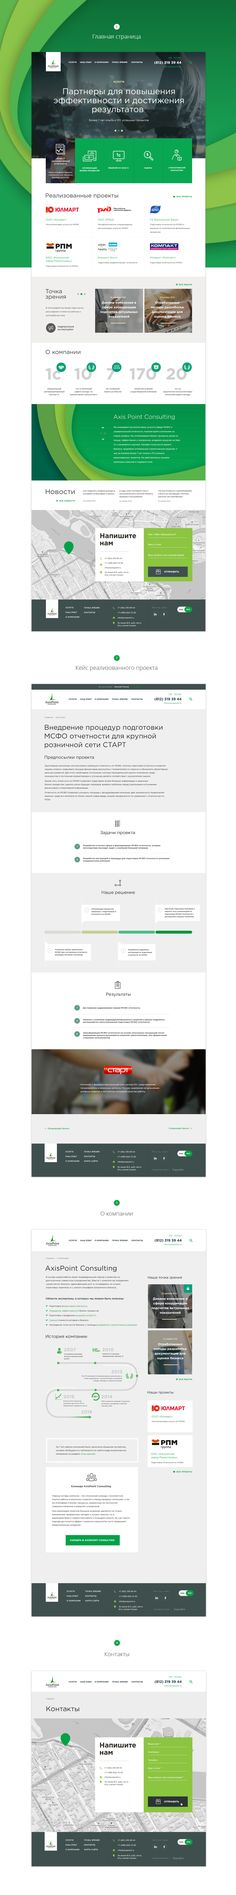 Корпоративный сайт консалтинговой компании AxisPoint, Сайт © Bquadro